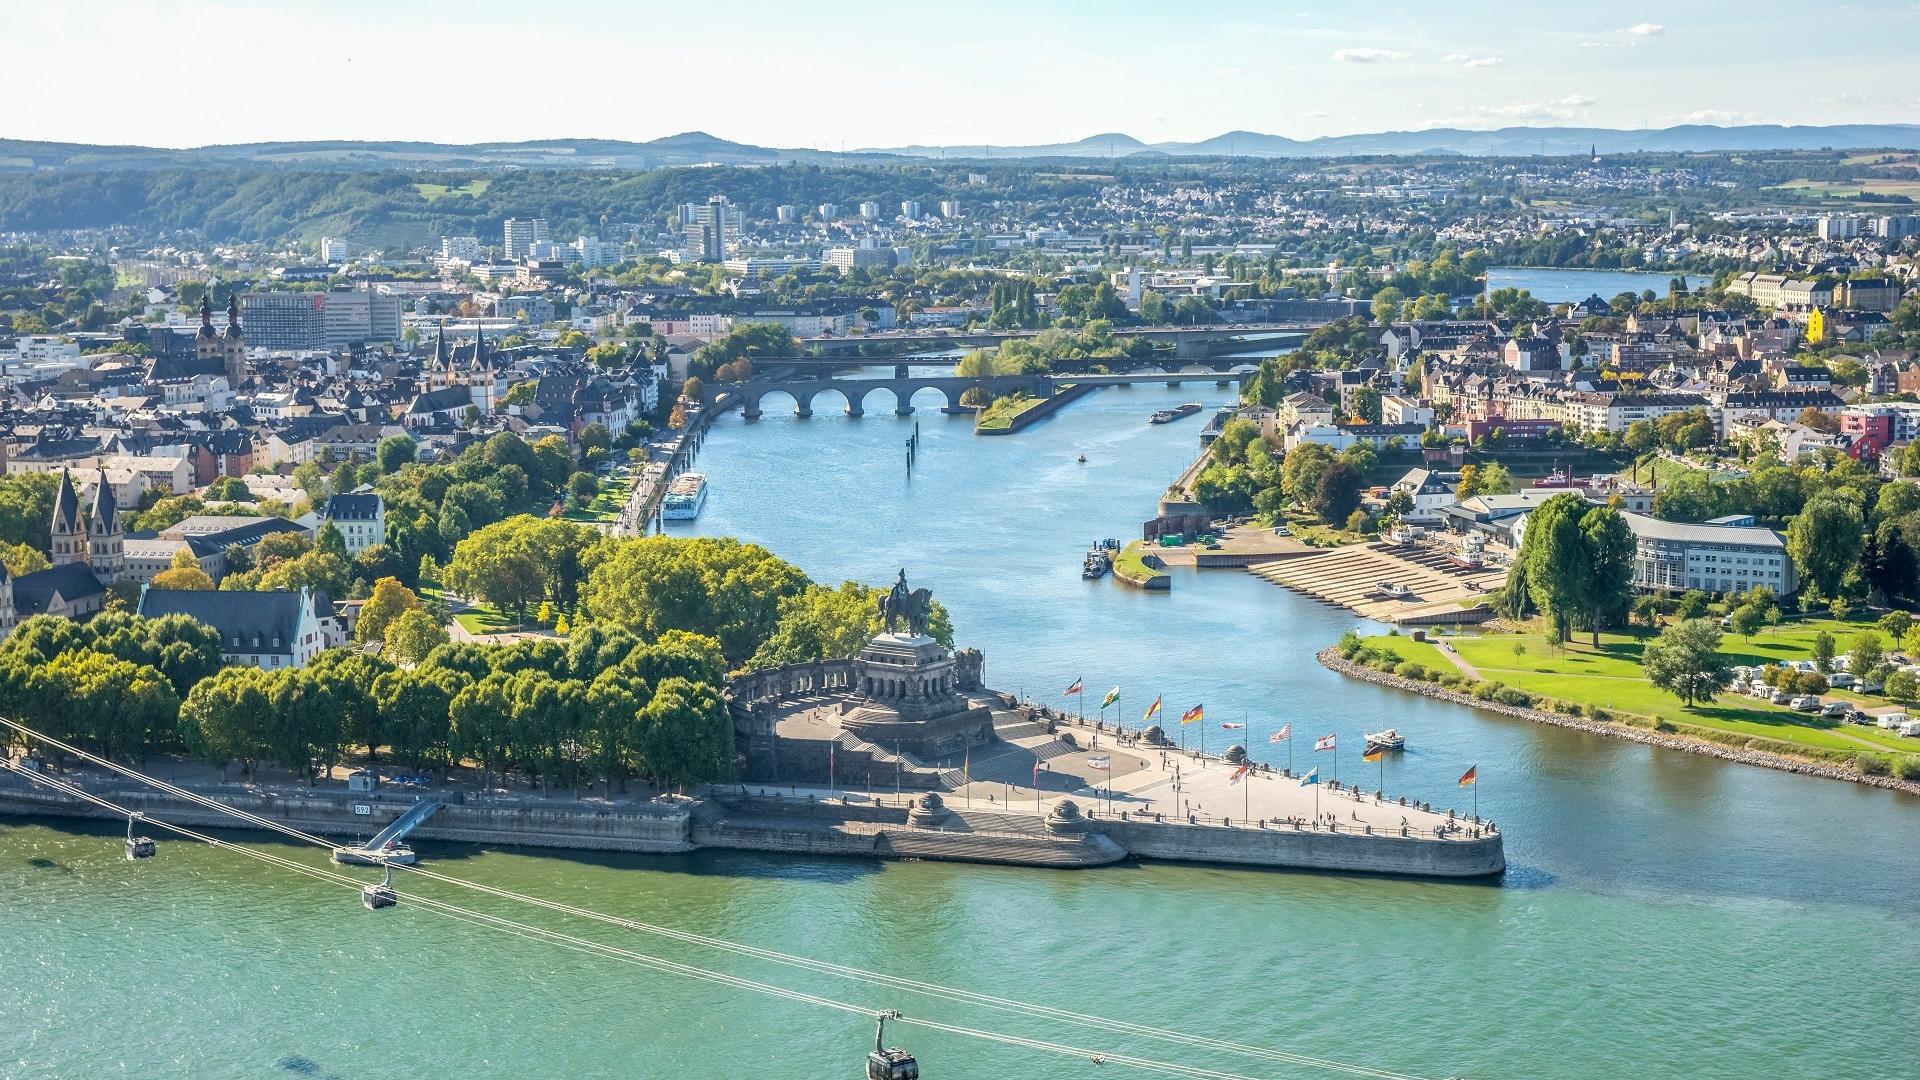 Dagaanbieding - 3 dagen luxe 4*-hotel bij Koblenz incl. ontbijt en dinerbuffet dagelijkse koopjes